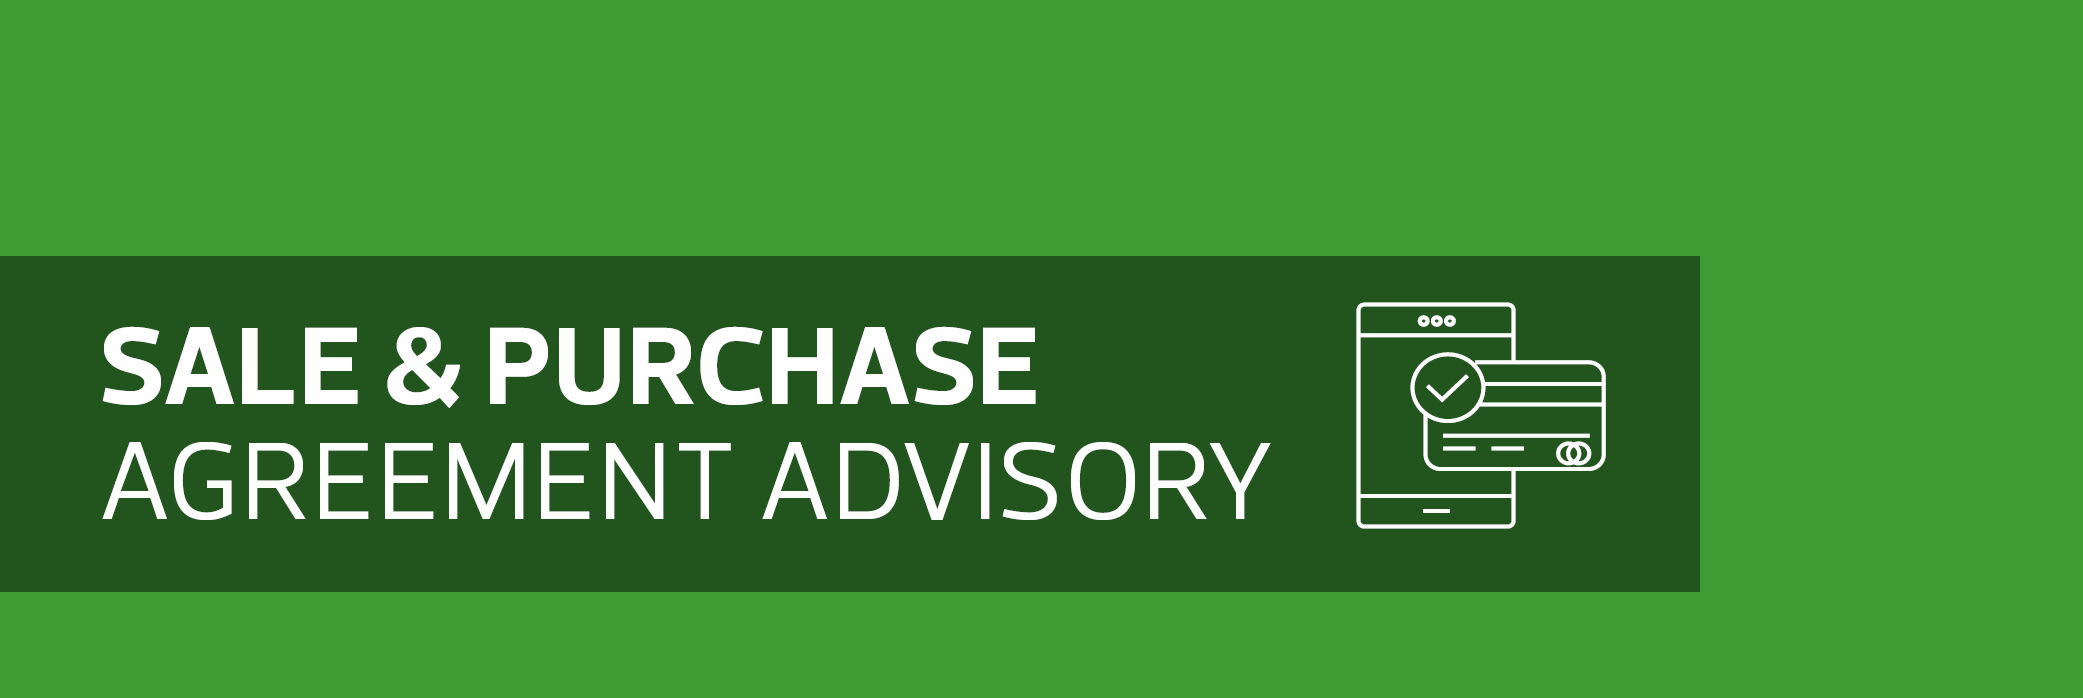 Sale & purchase agreement advisory